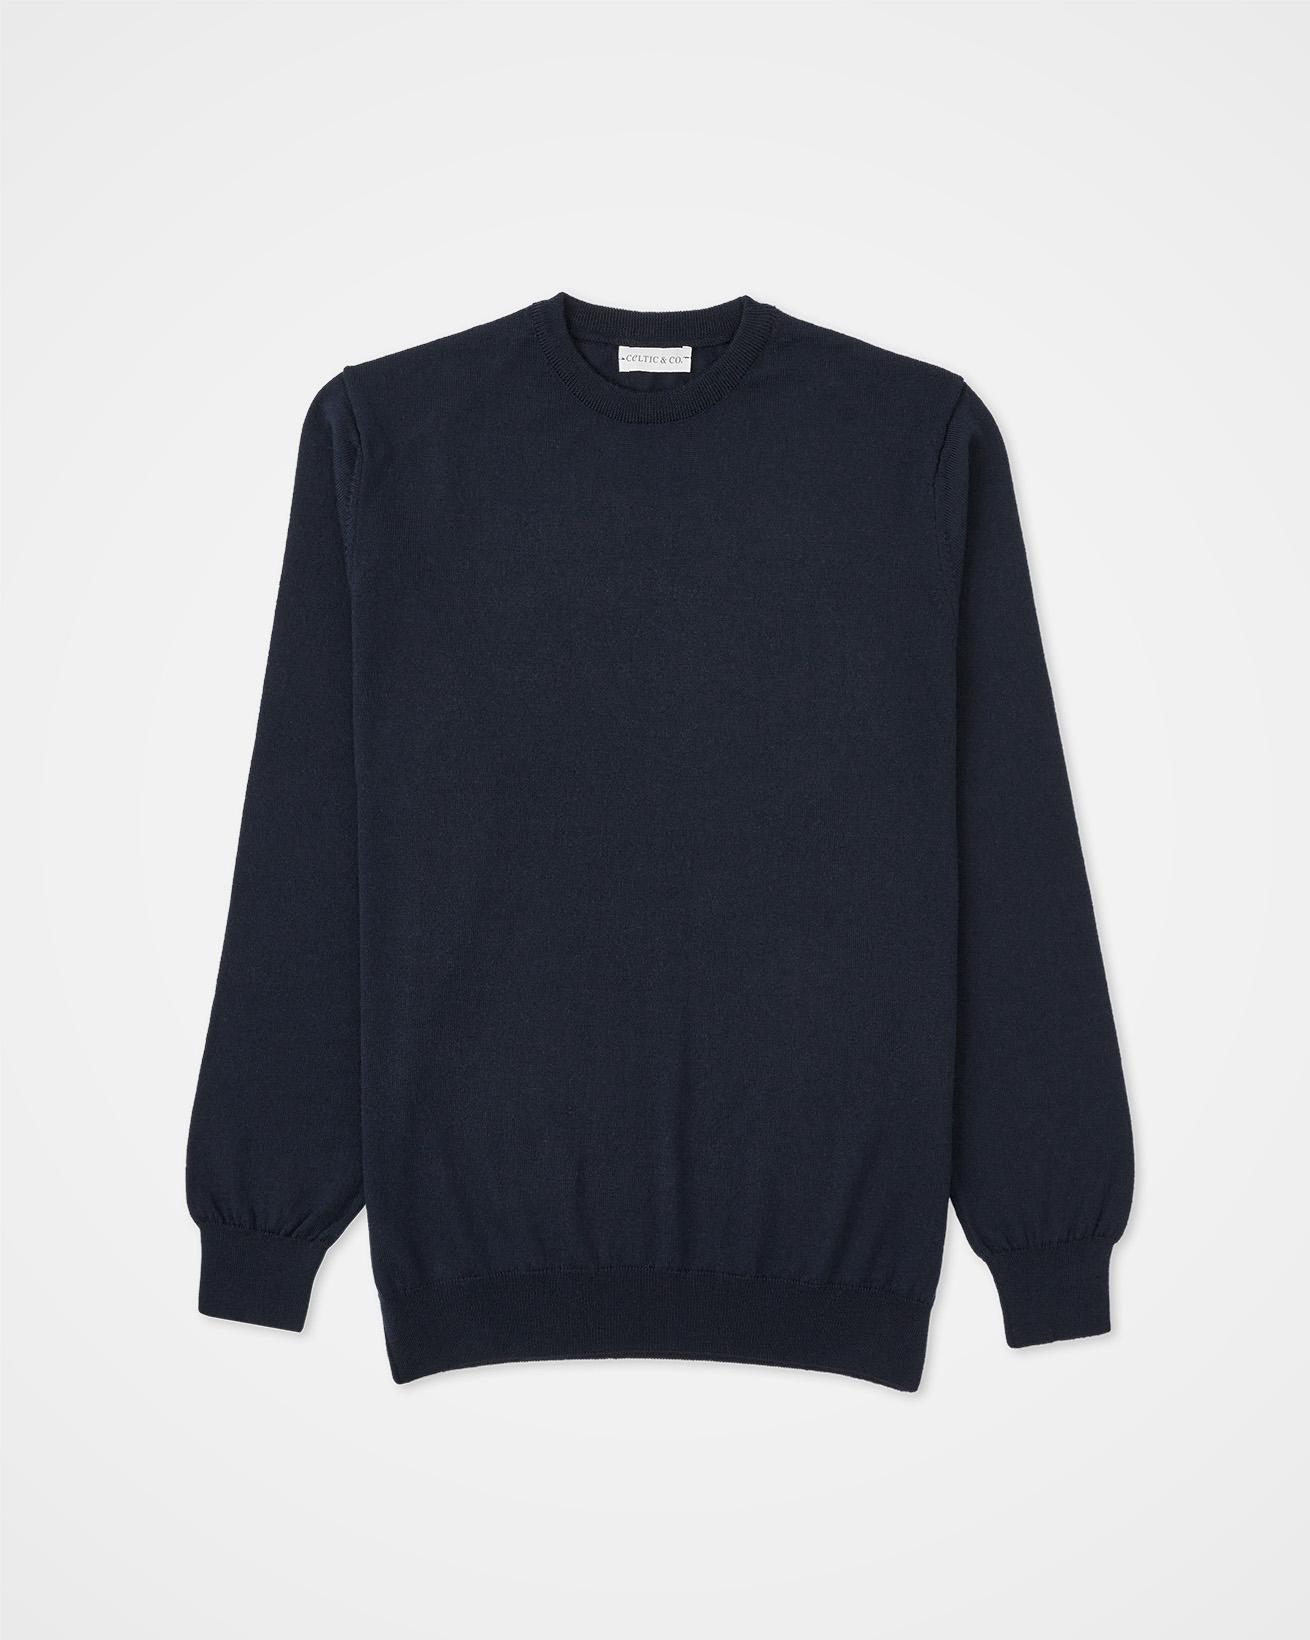 Men's Fine Knit Crew Sweater